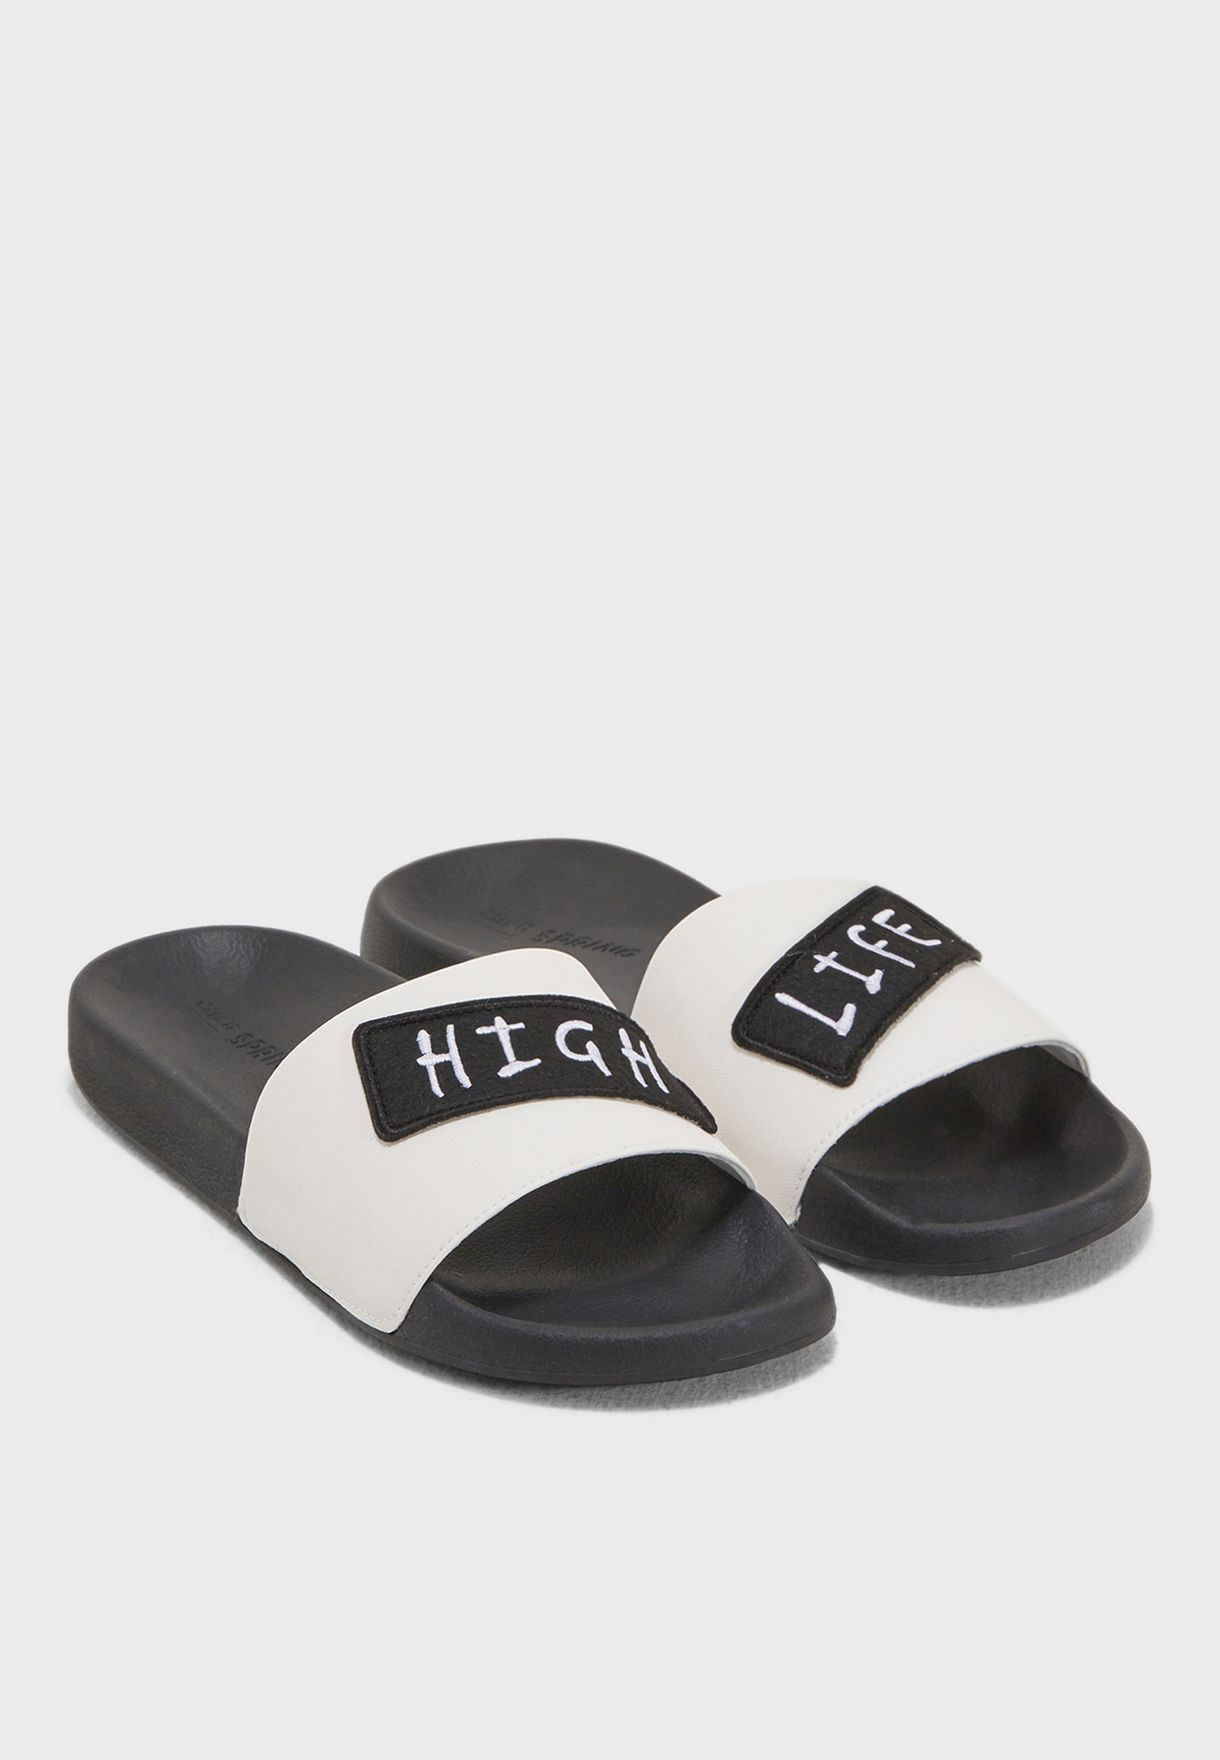 a33f7aa6d95 Shop call it spring multicolor johen sandals johen for men in uae ca rmx  jpg 1220x1760